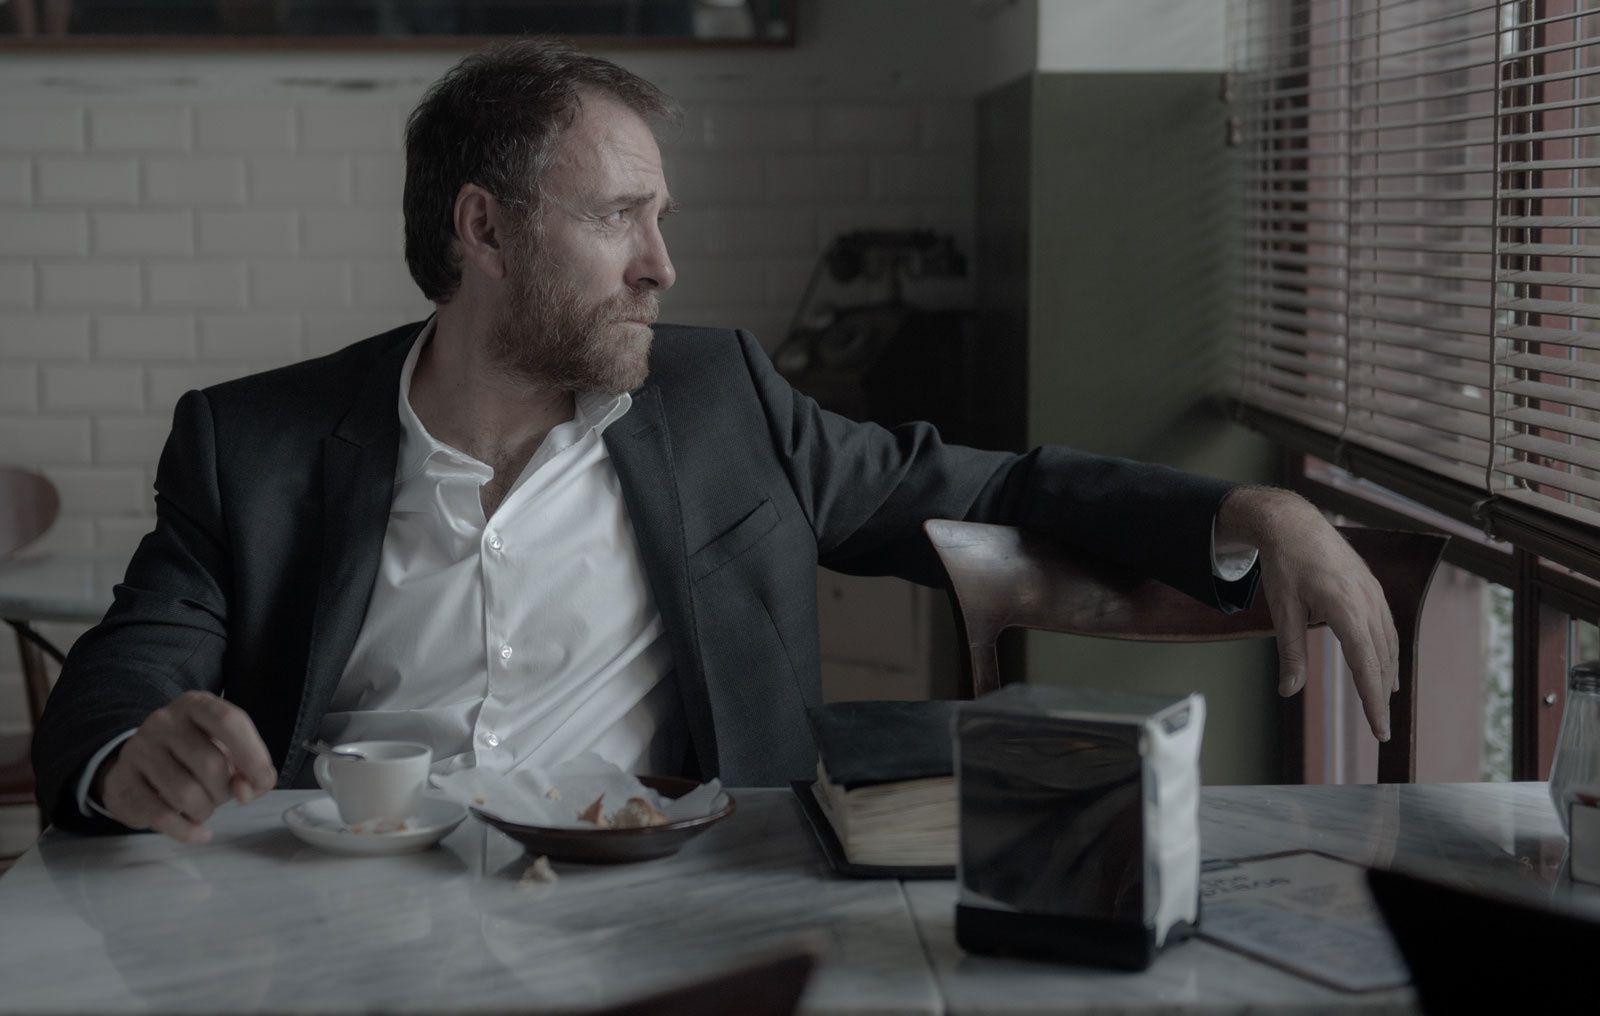 The Place (BANDE-ANNONCE) avec Valerio Mastandrea, Marco Giallini, Alessandro Borghi - Le 30 janvier 2019 au cinéma